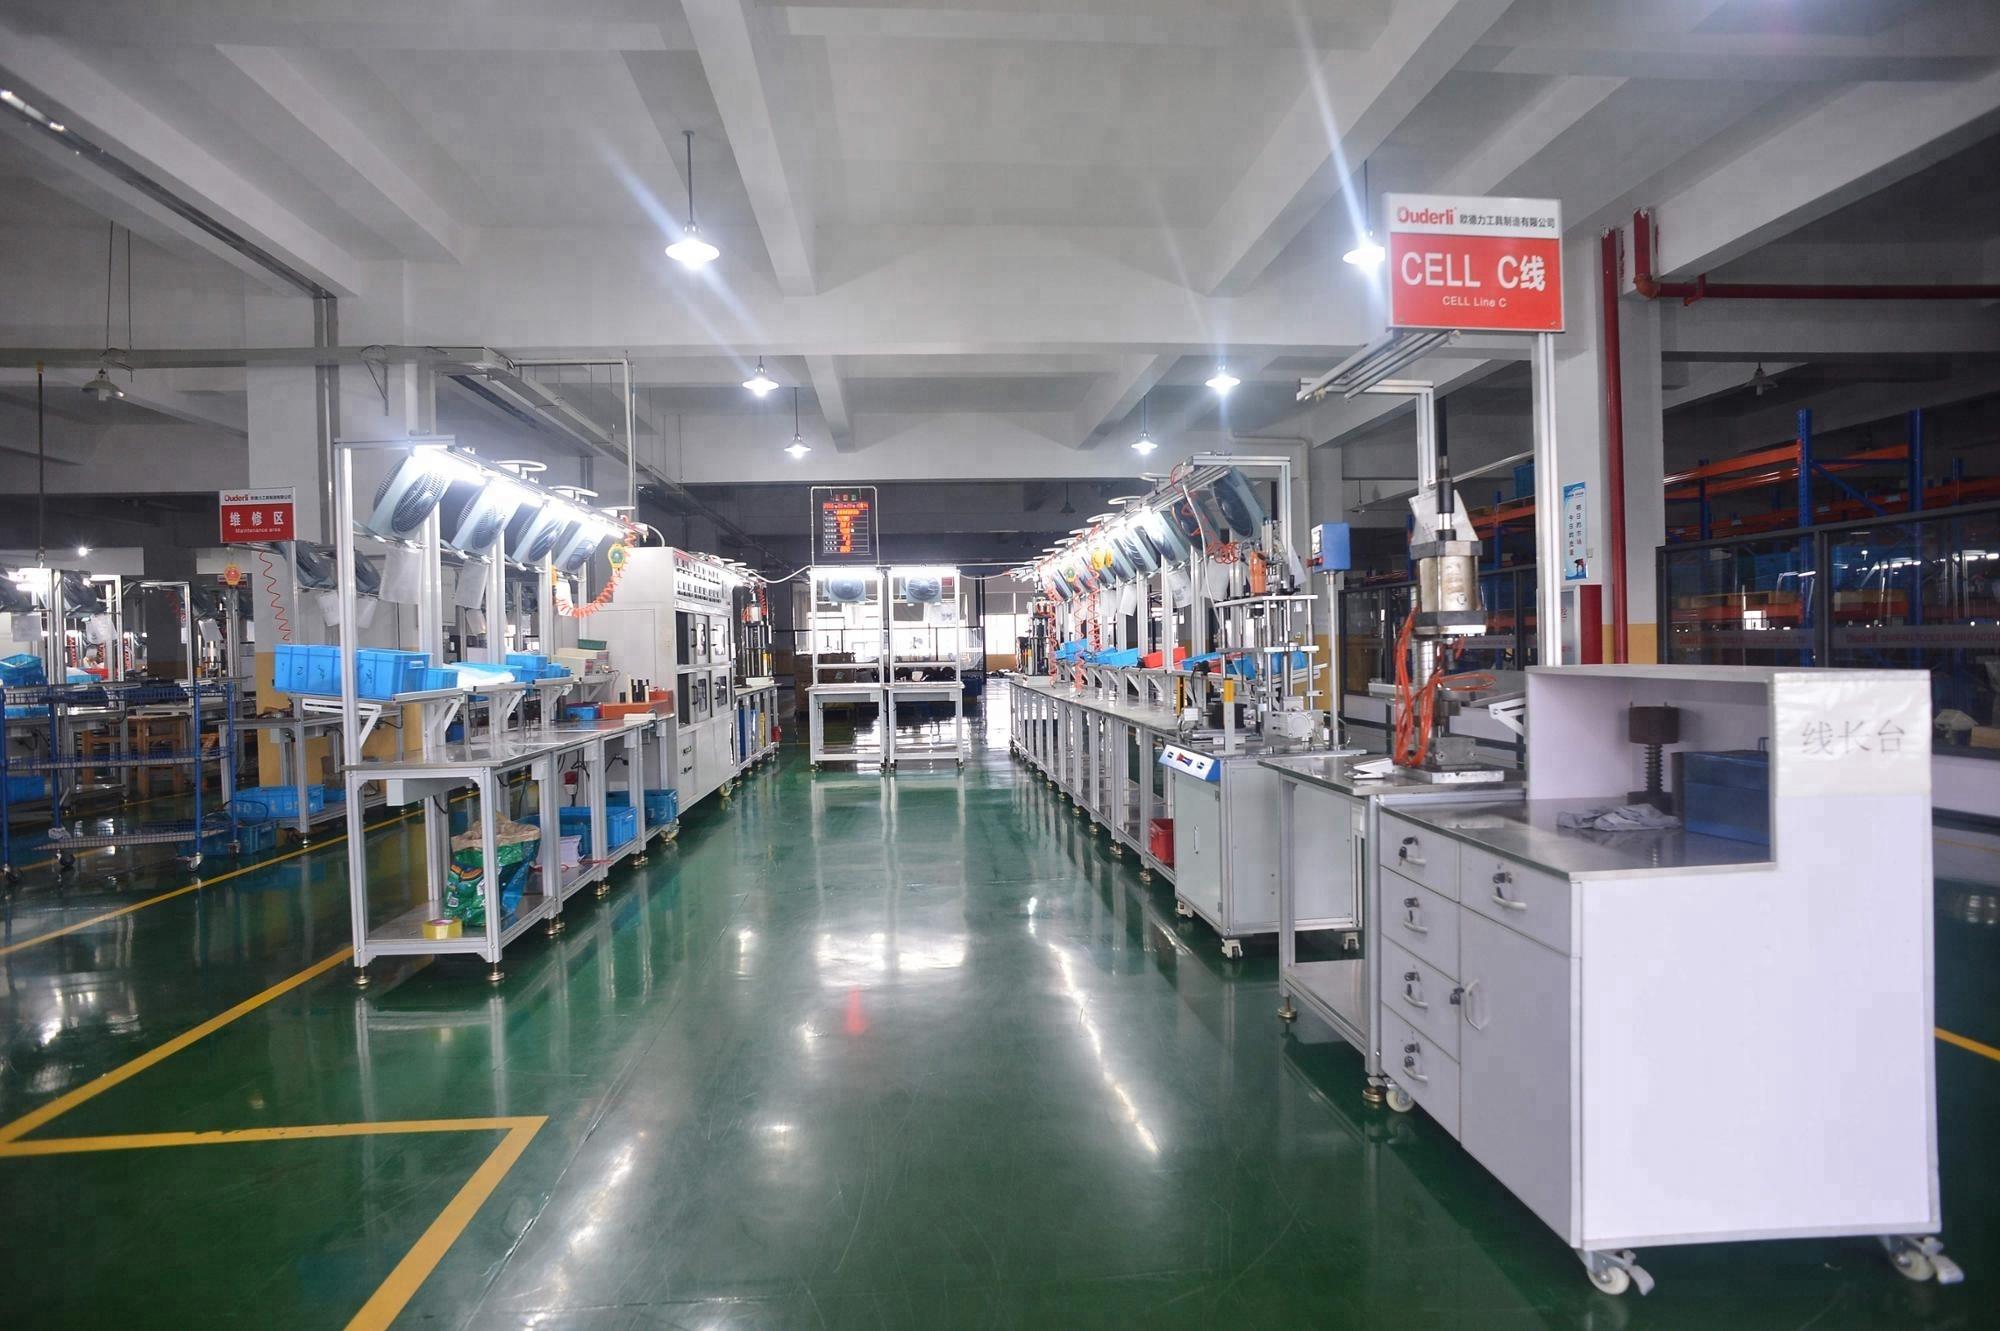 Ouderli 2200w 355mm professional metal cut-off machine tools